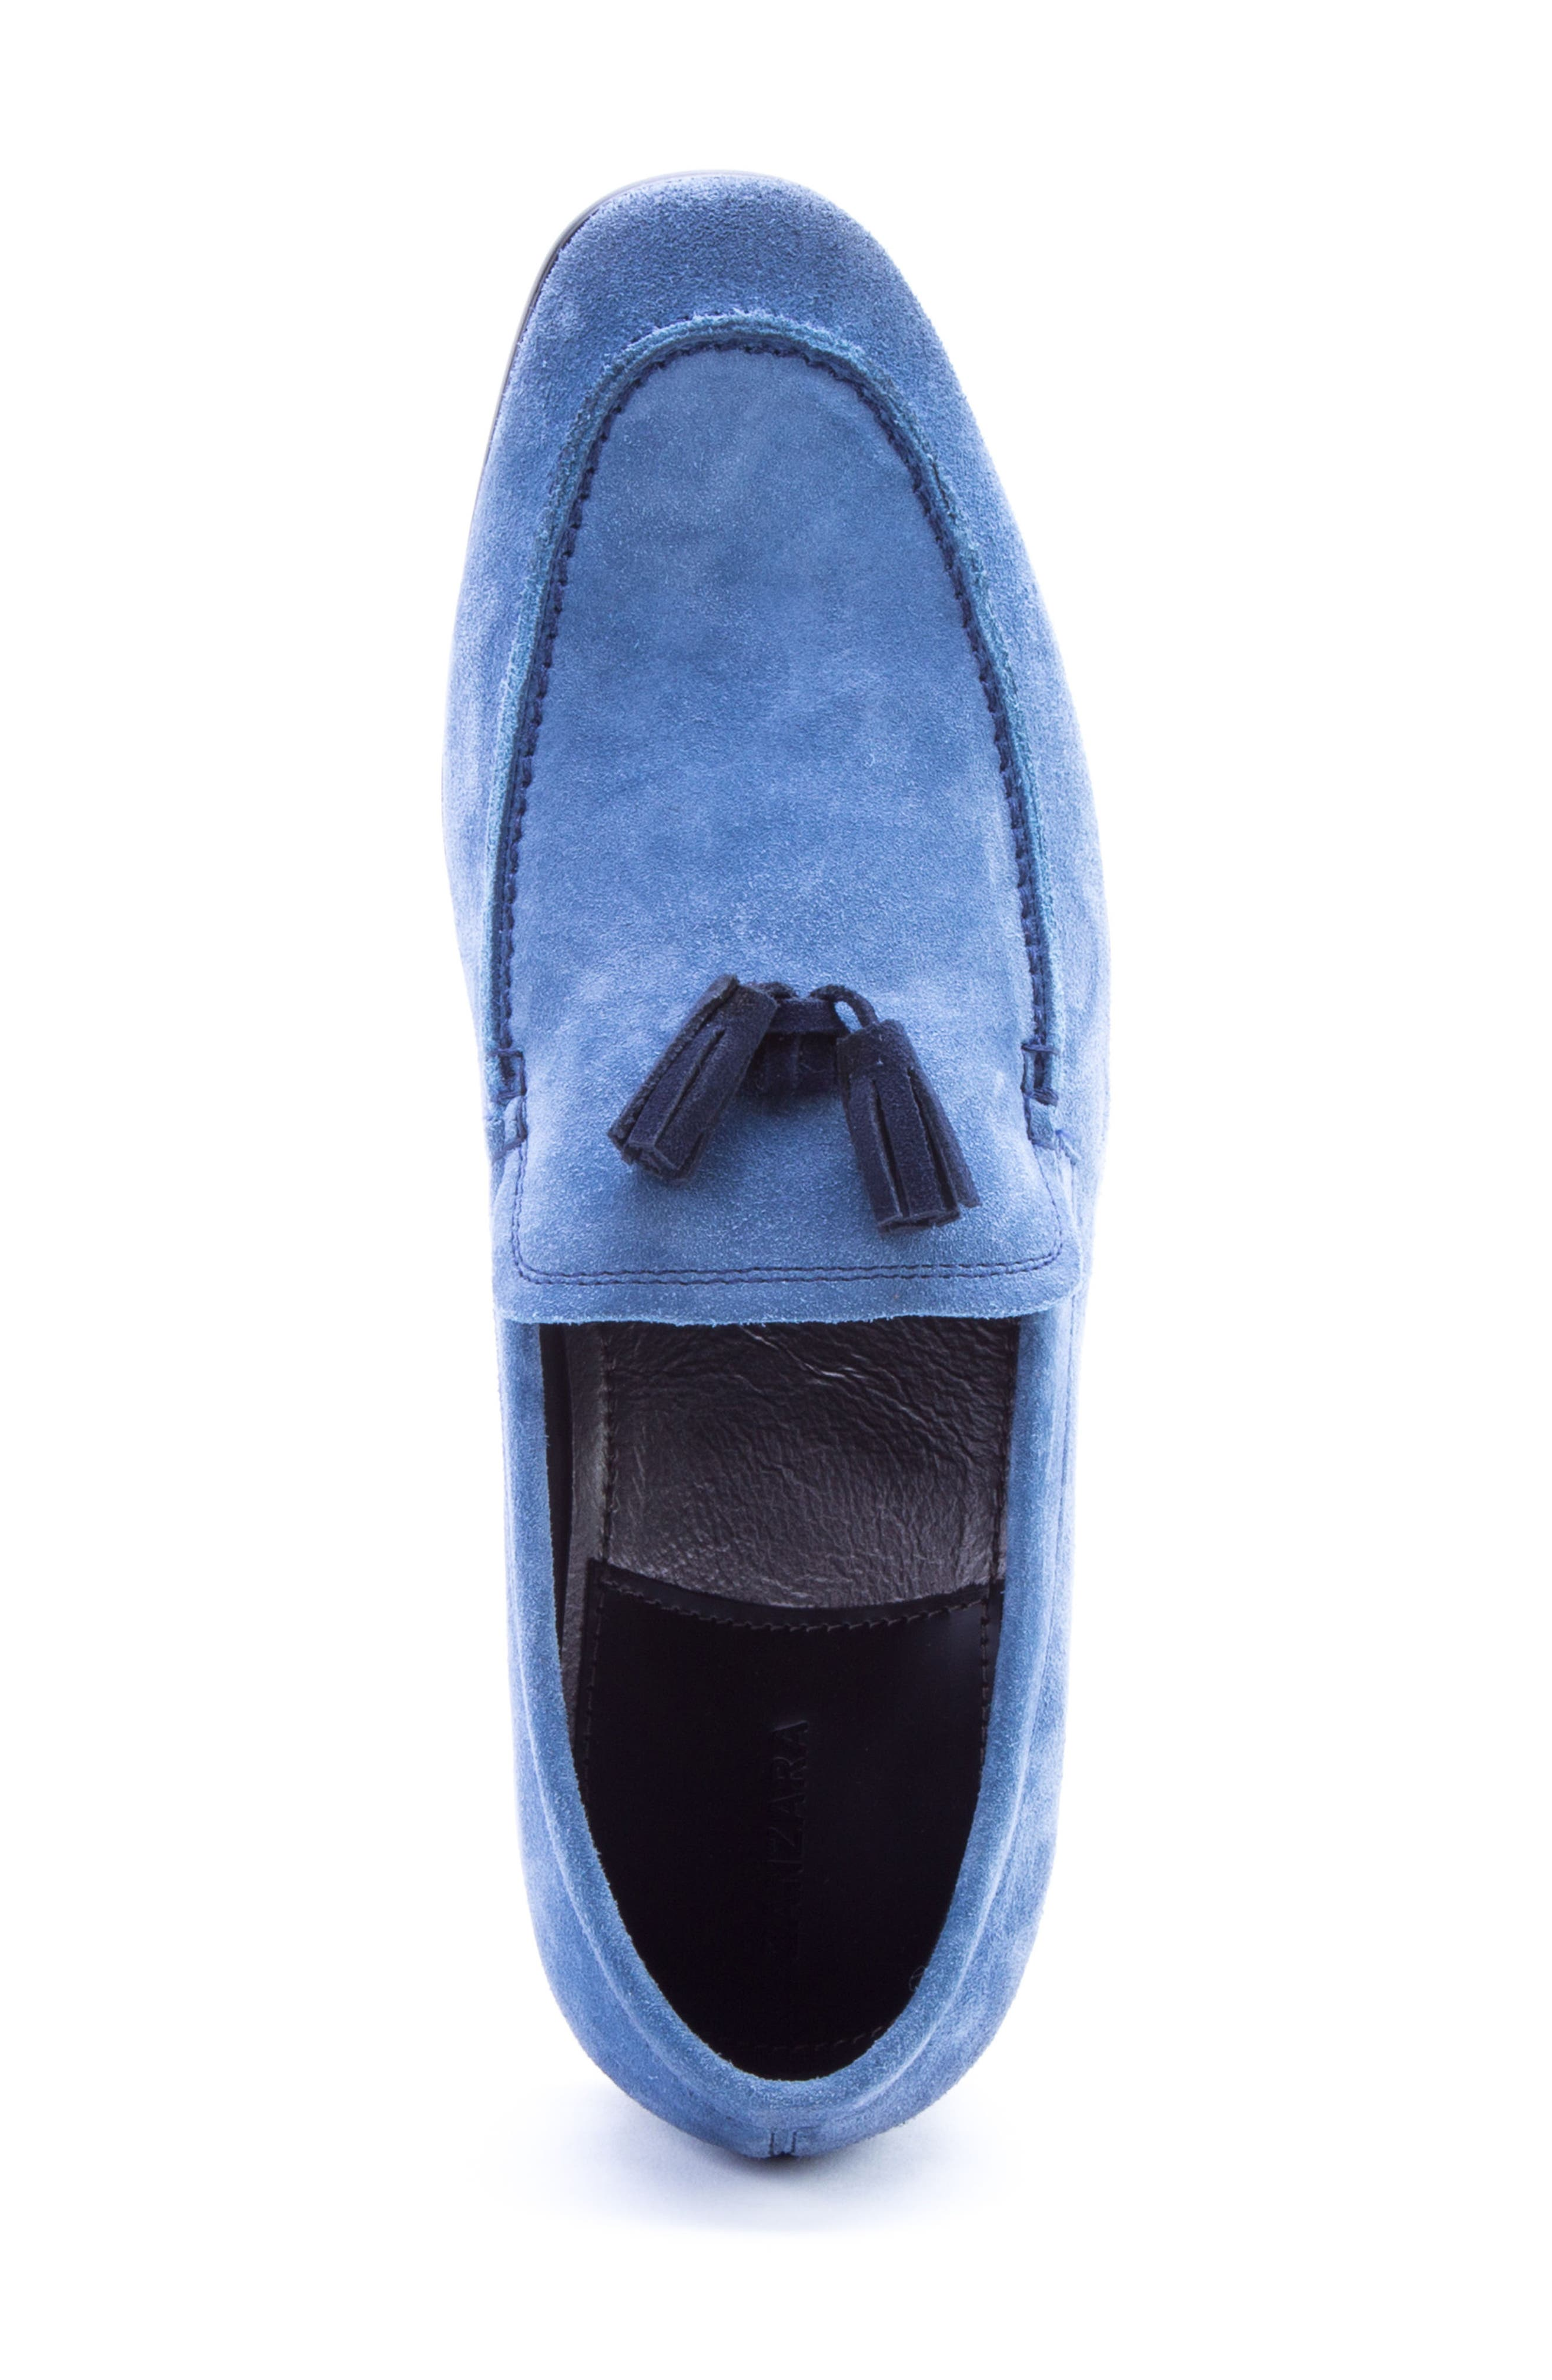 Severn Tassel Venetian Loafer,                             Alternate thumbnail 5, color,                             Blue Suede